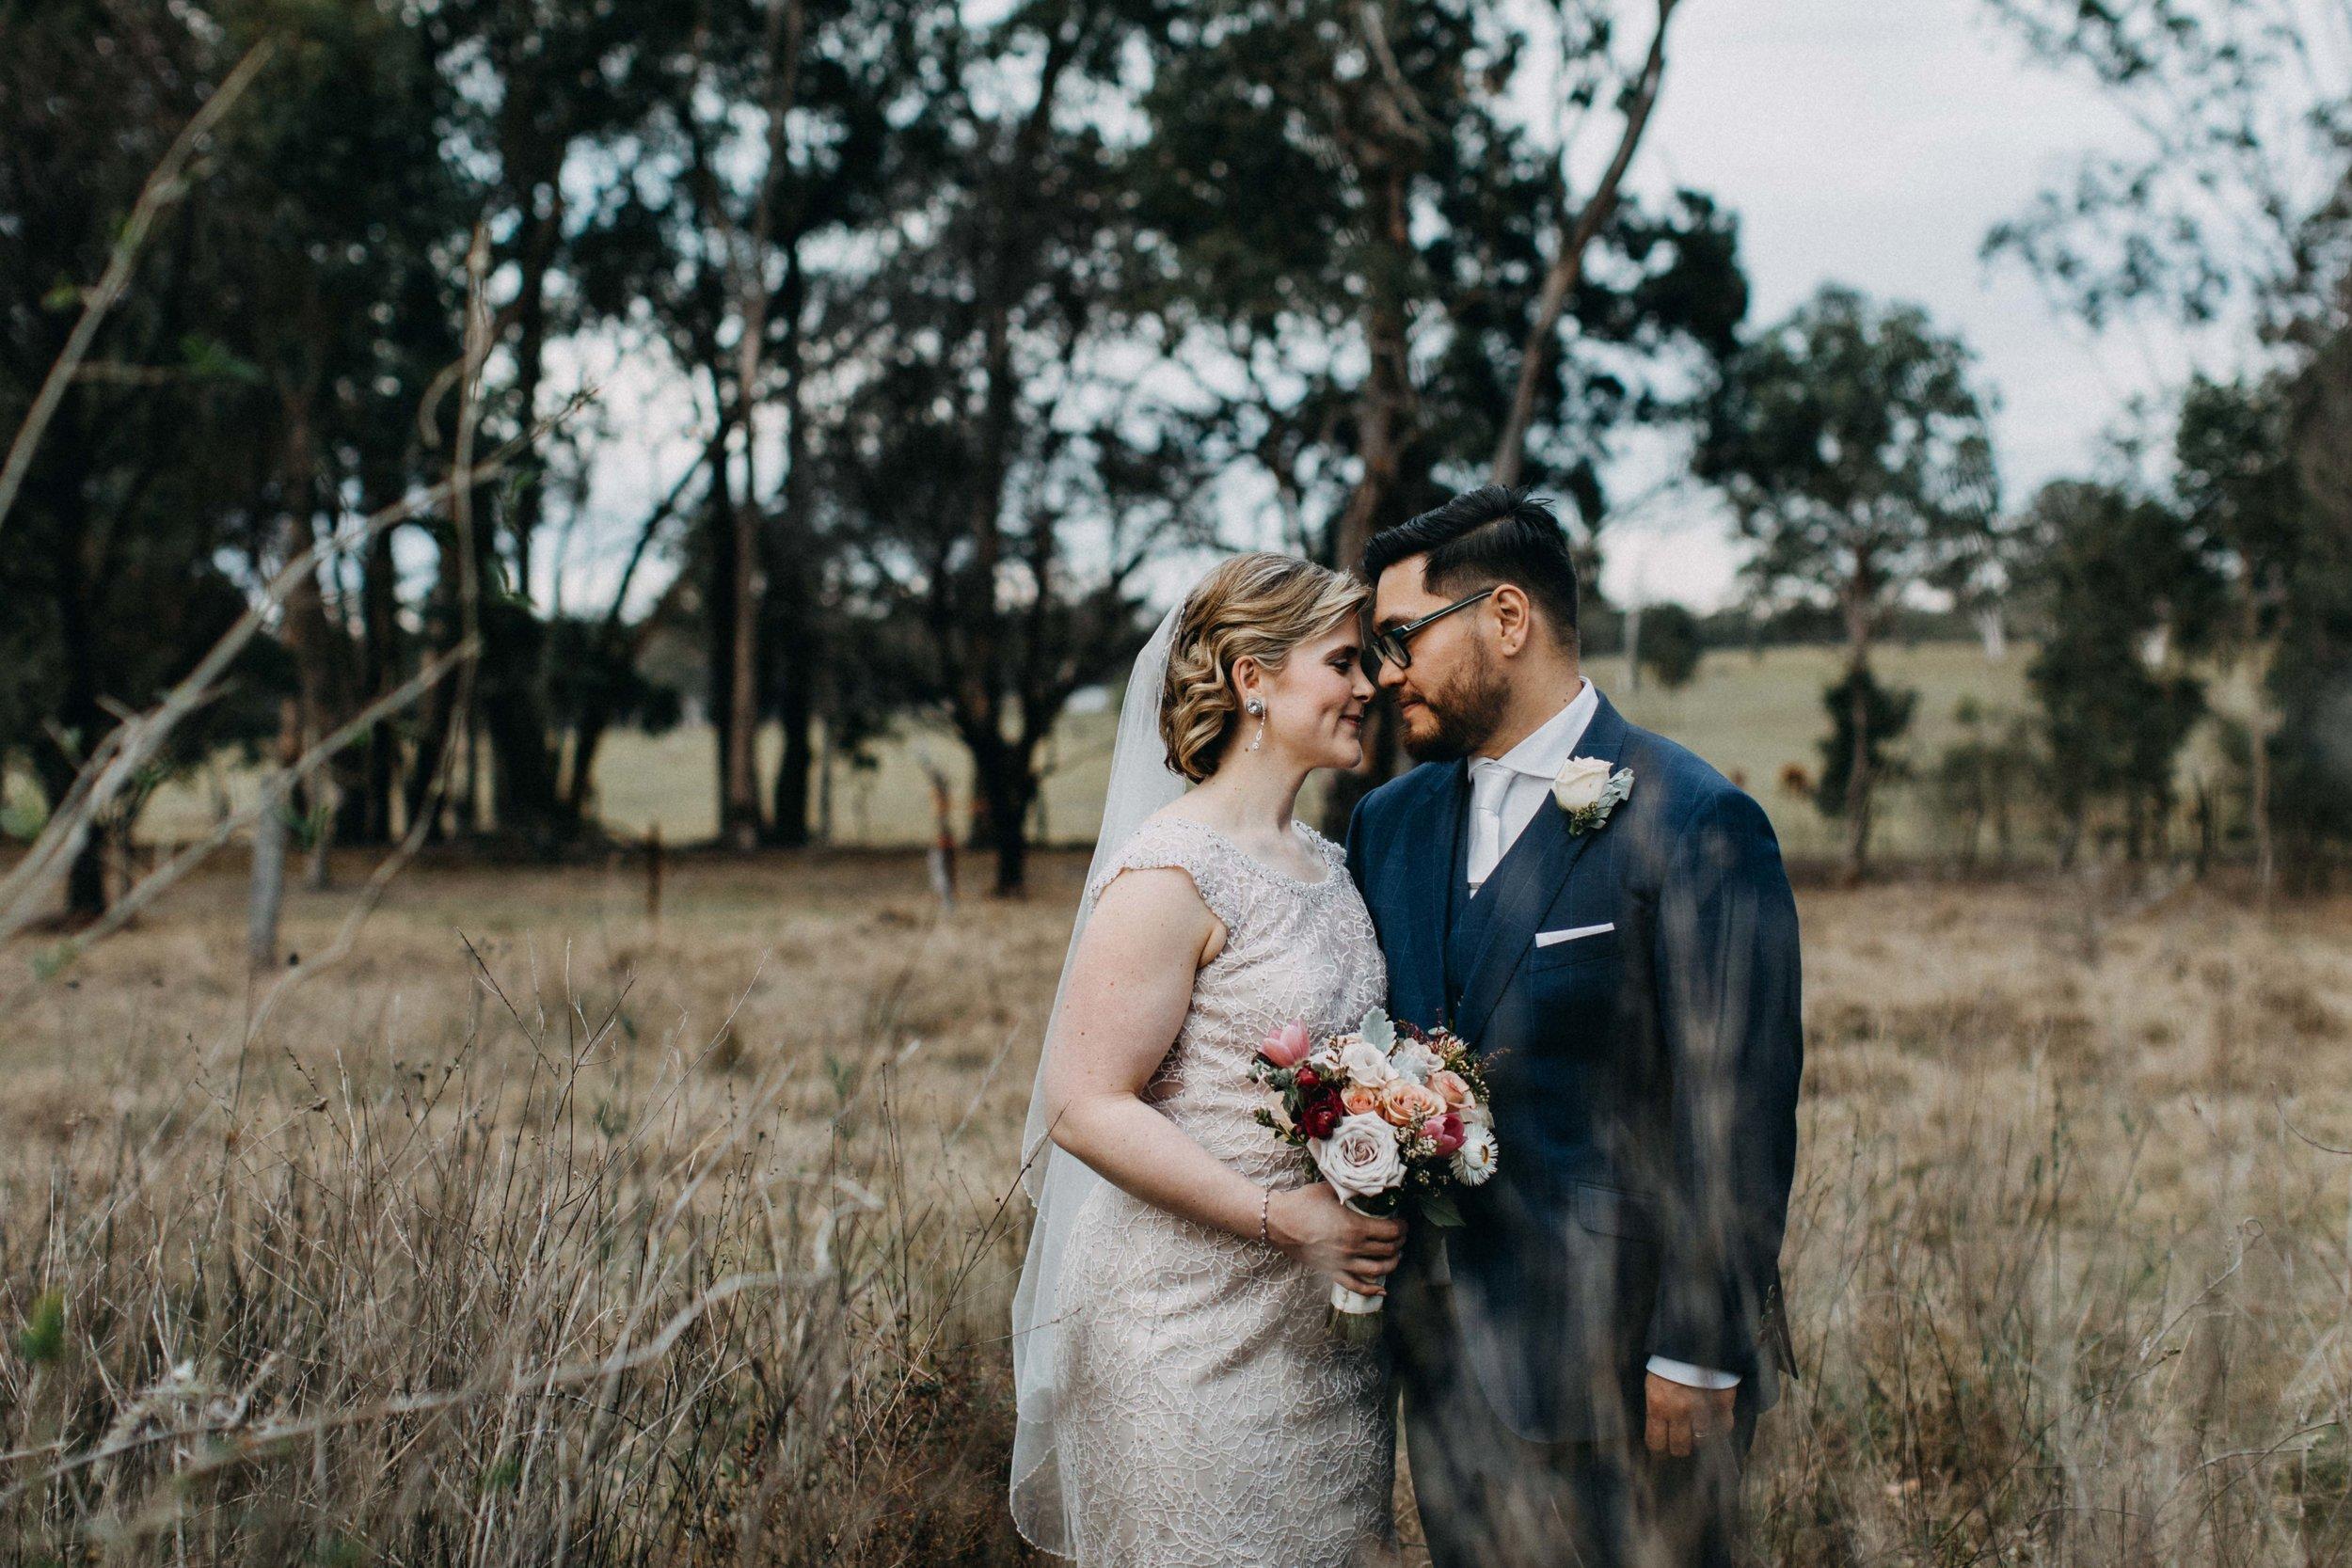 appin-house-wedding-macarthur-www.emilyobrienphotography.net-121.jpg